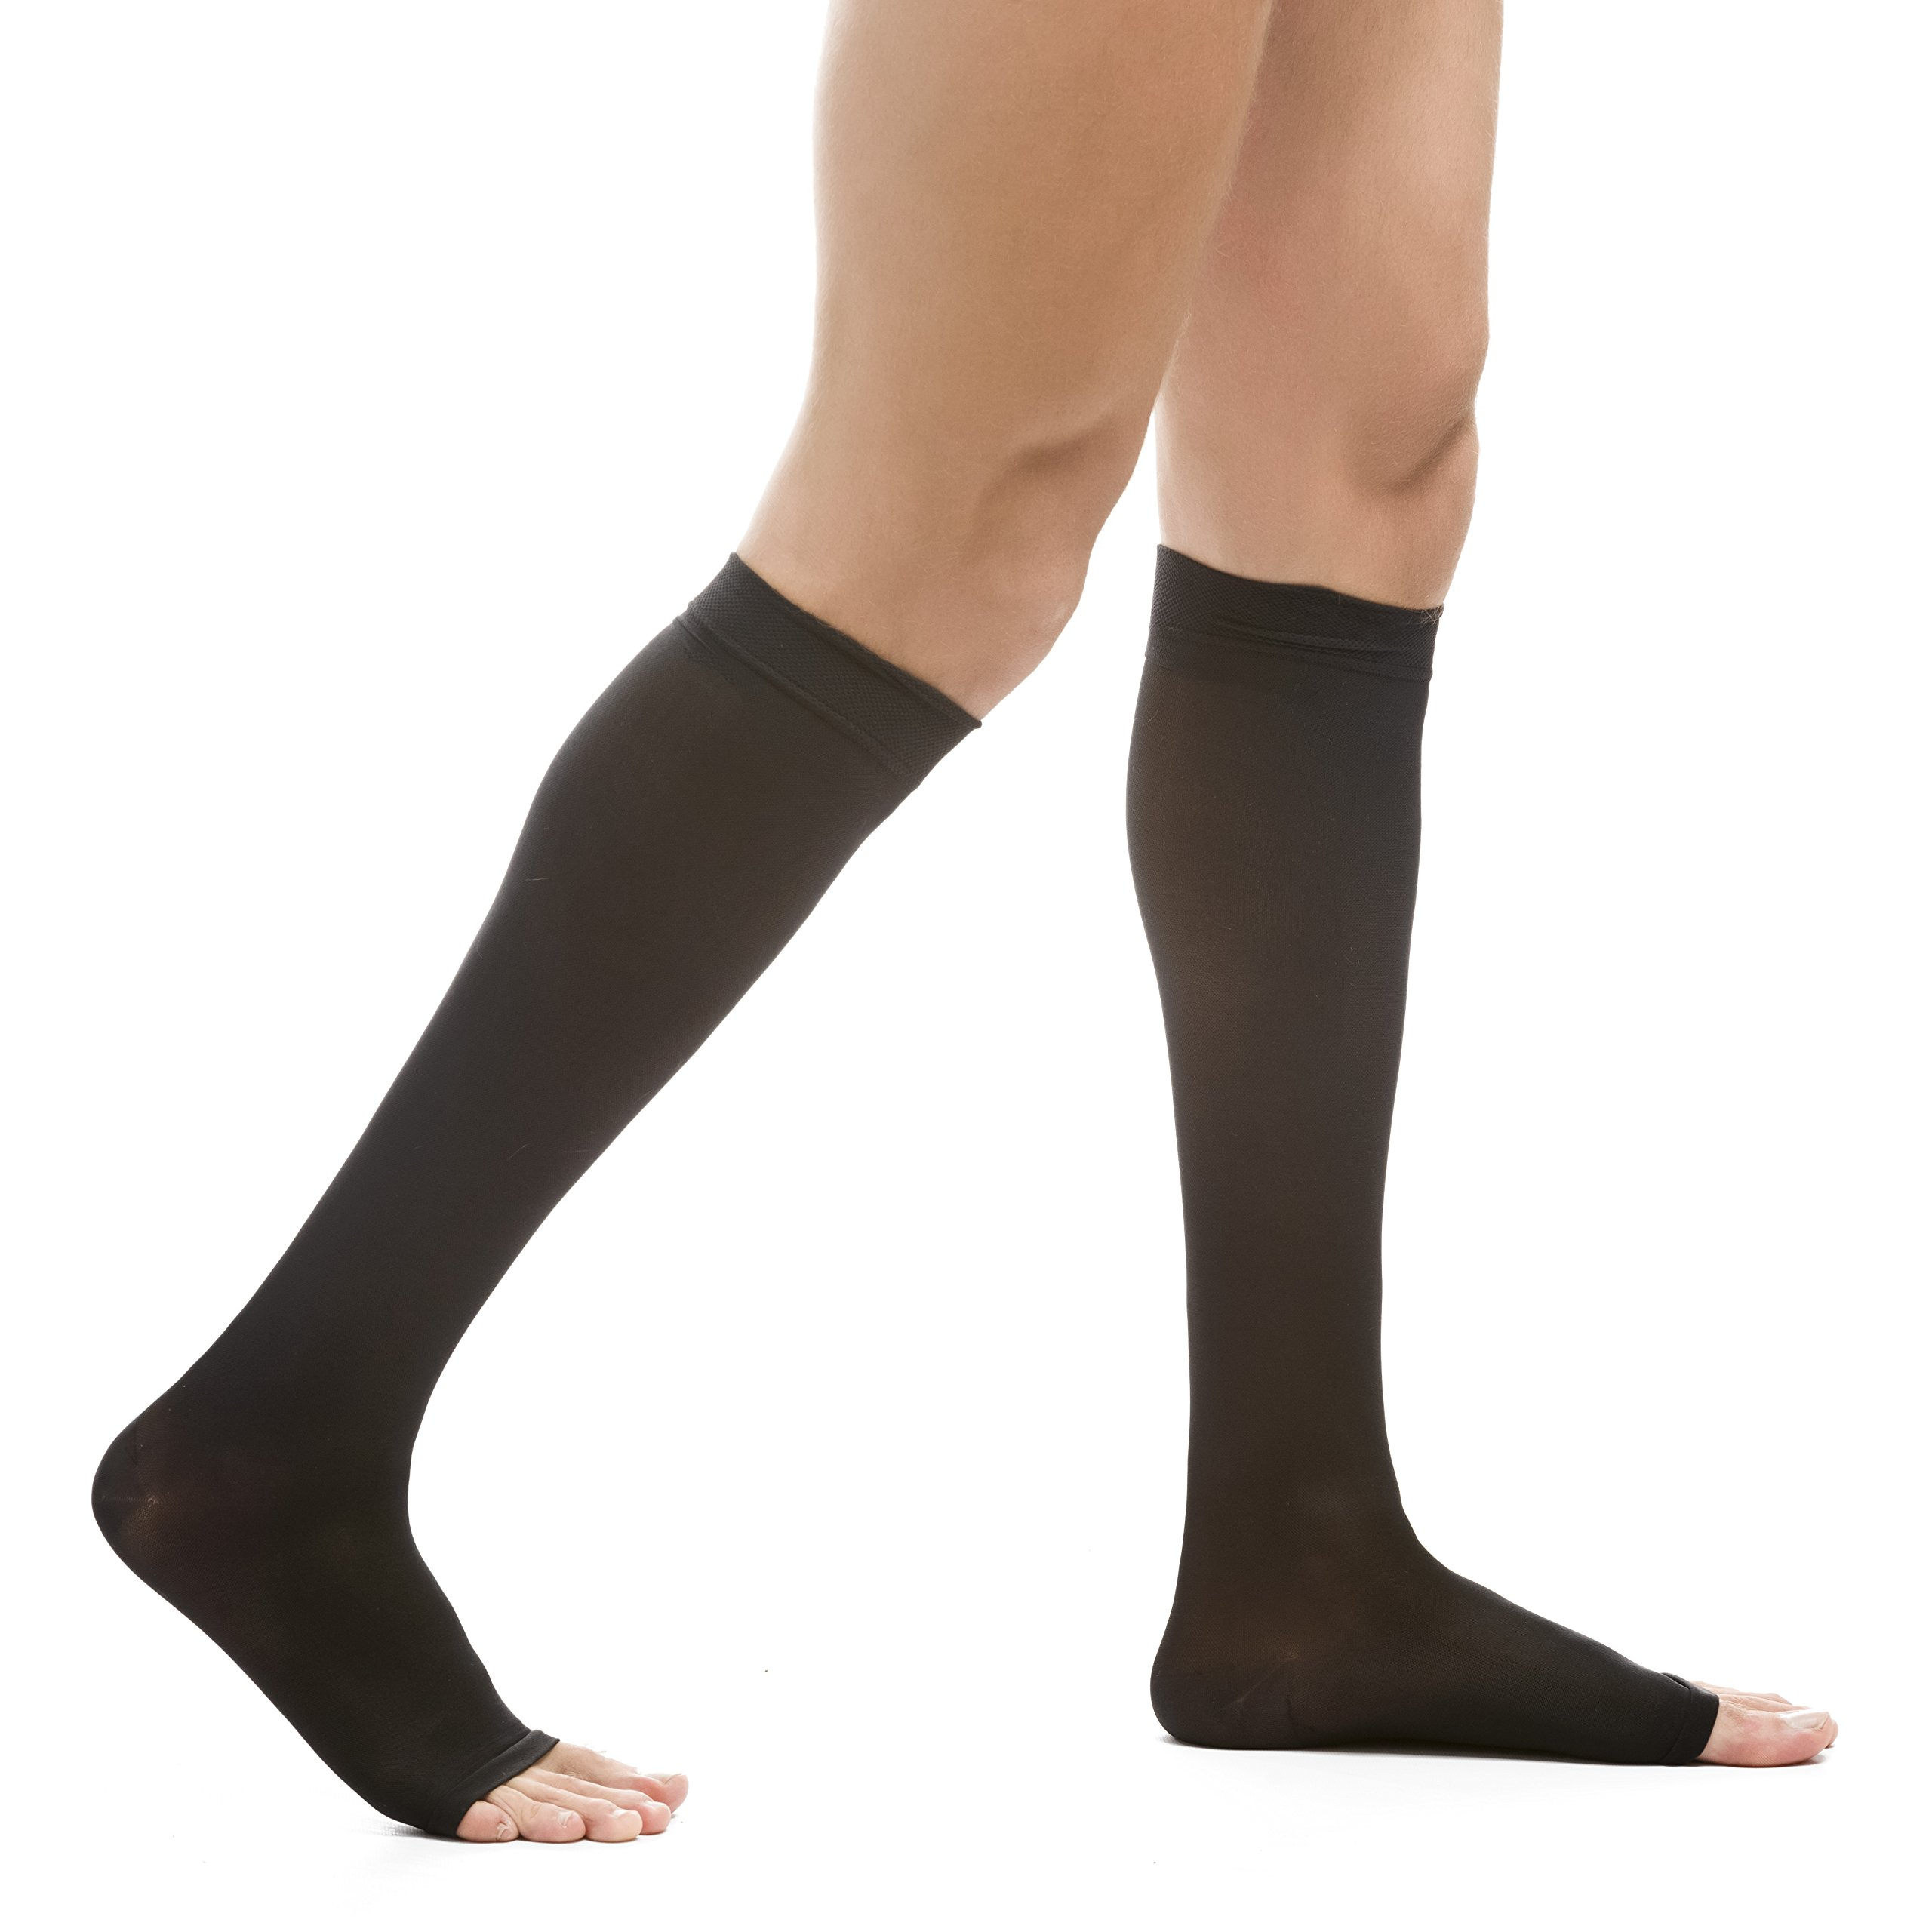 fcf04b7d4ad EvoNation Men s USA Made Open Toe Graduated Compression Socks 20-30 mmHg  Firm Pressure Microfiber